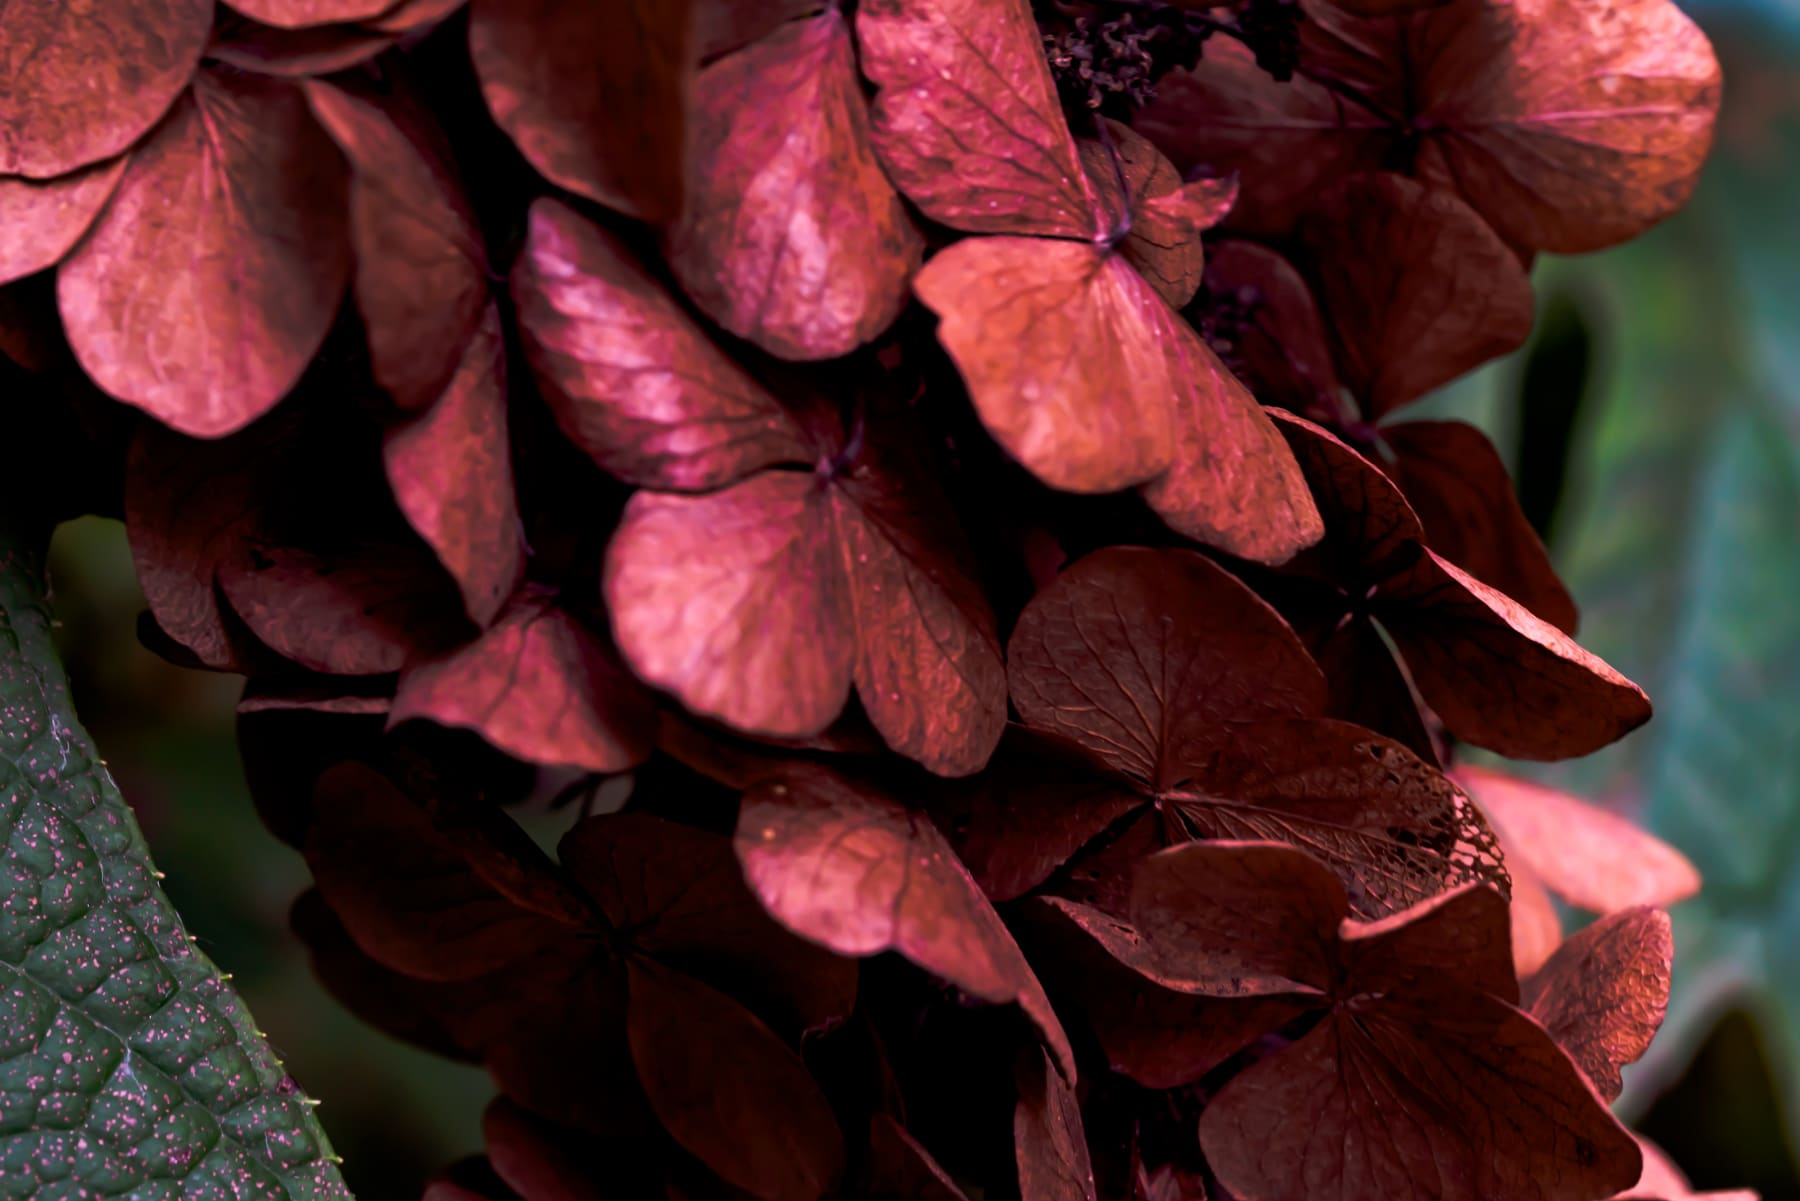 Rob Ventura, Untitled #2 (Botanical Photo), 2019